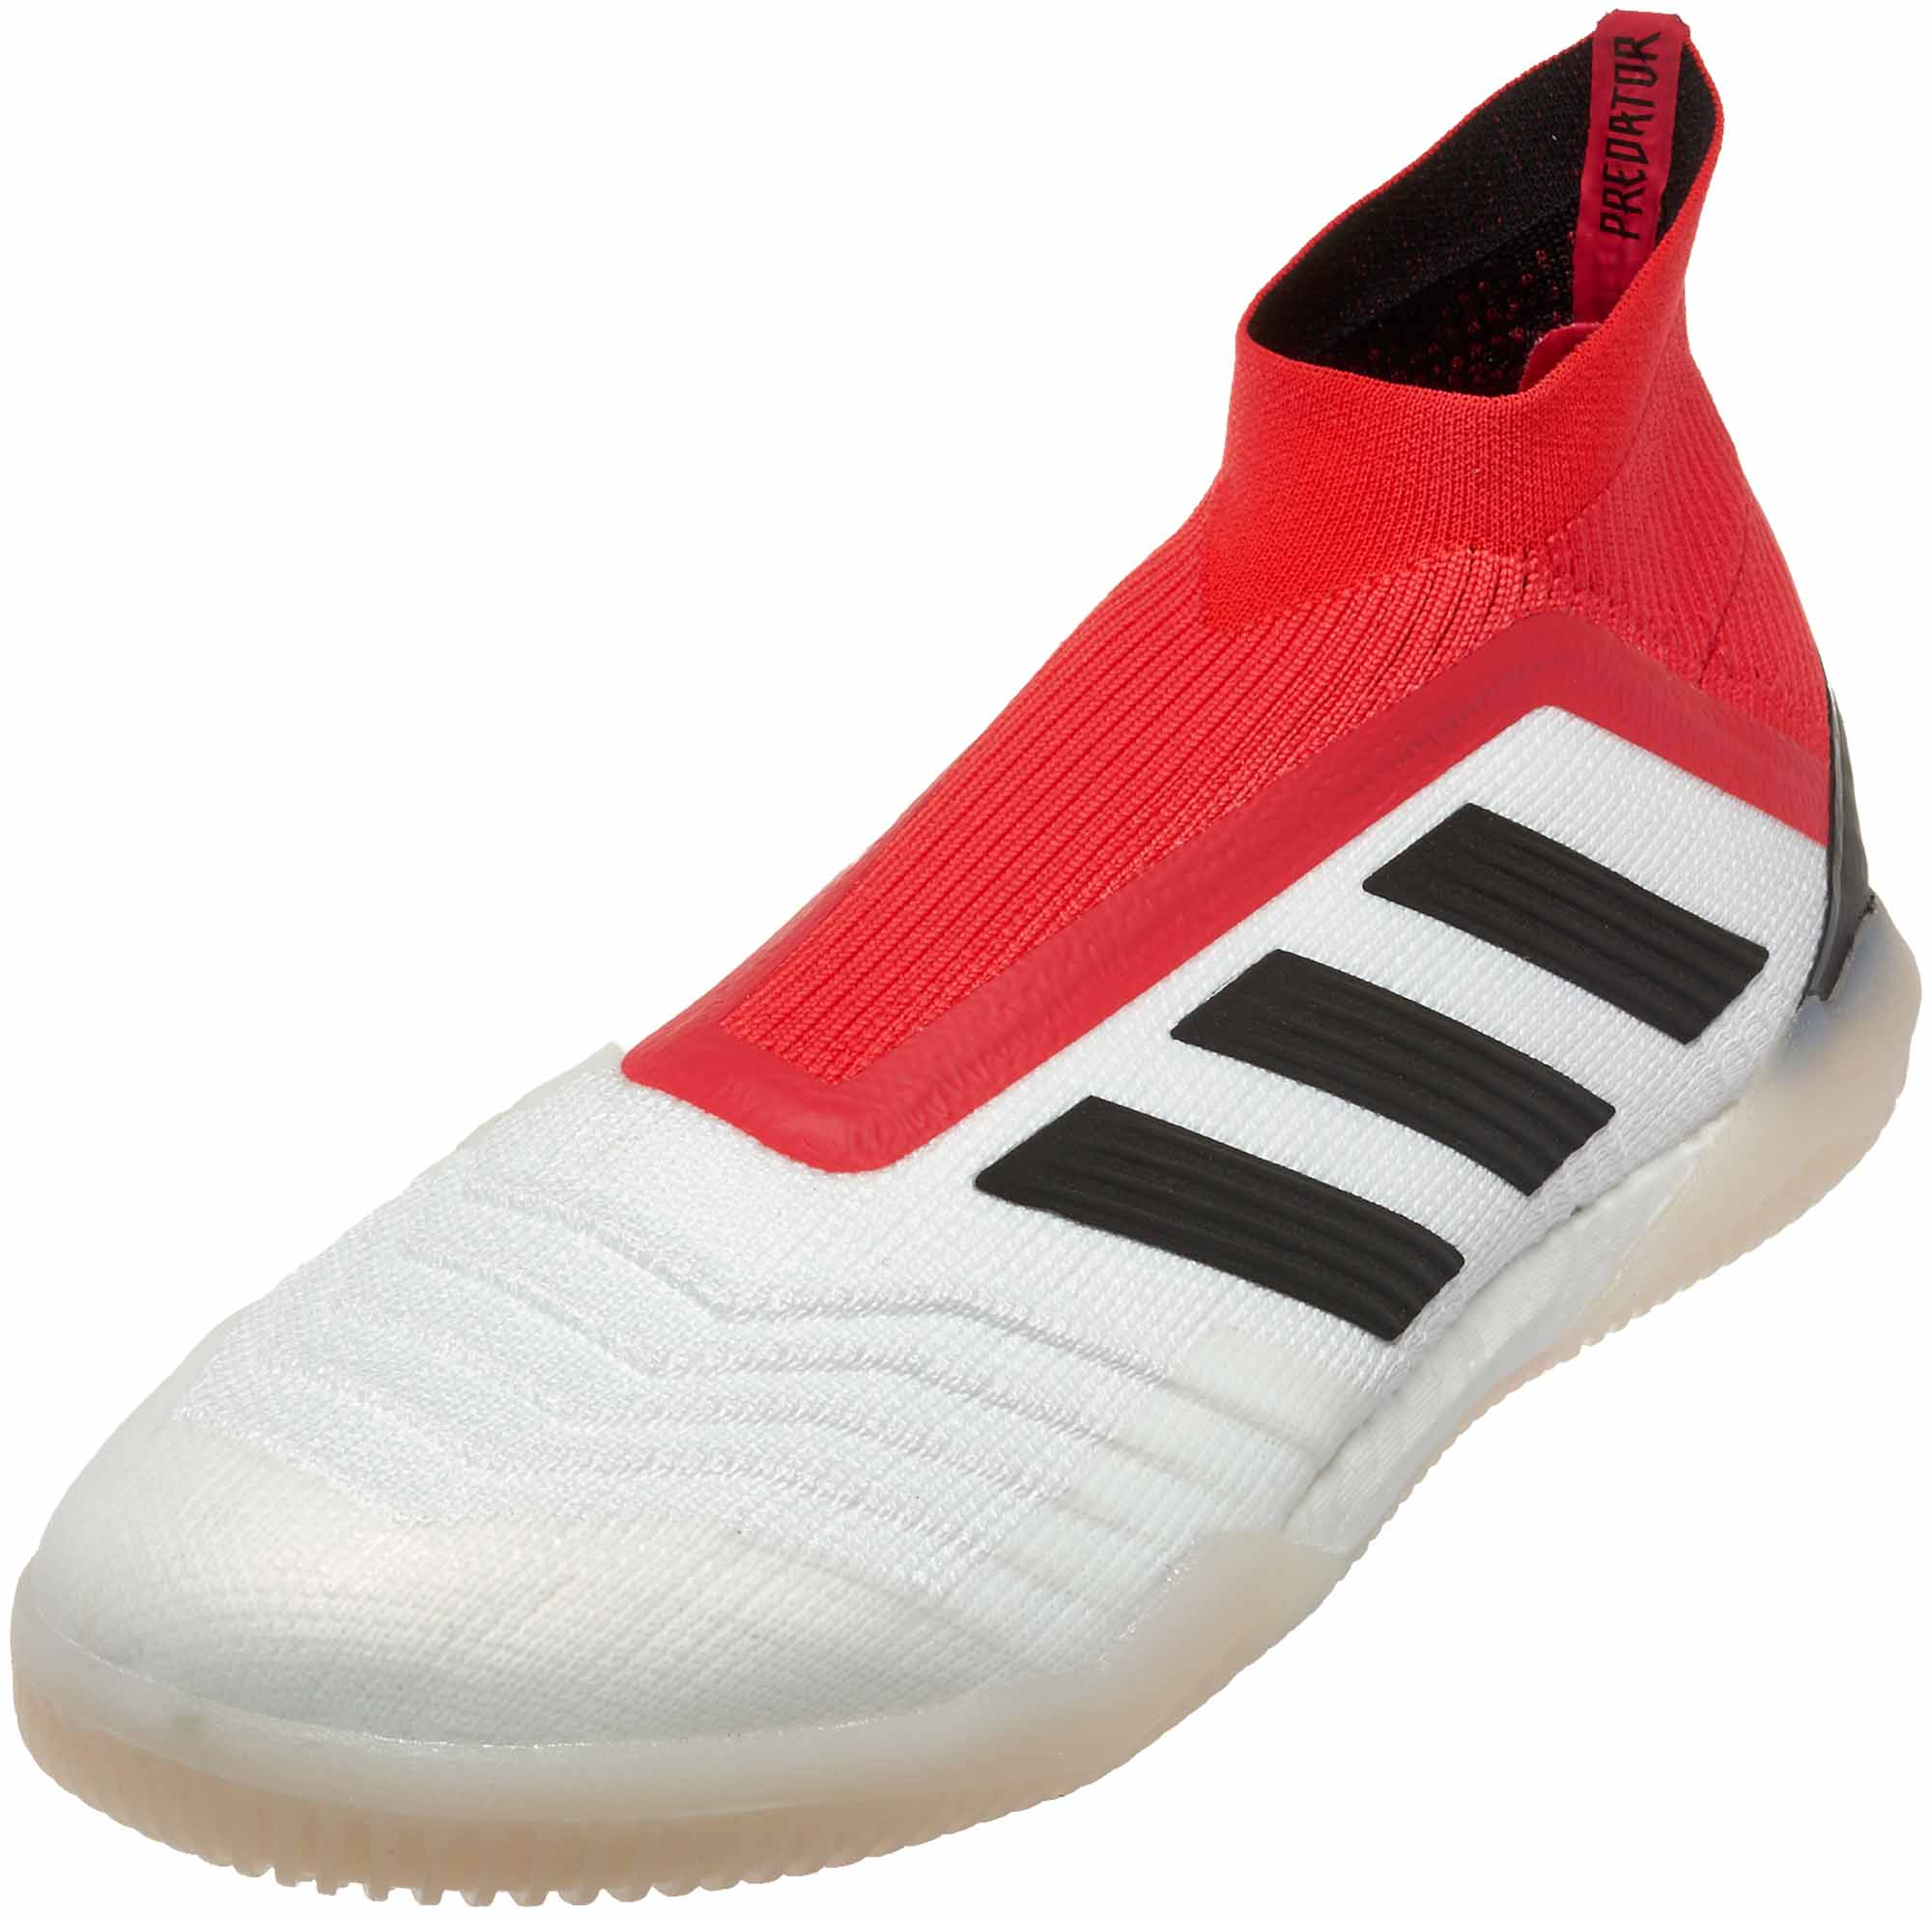 49dadc561a8 adidas Predator Tango 18+ IN - White   Real Coral - Soccer Master